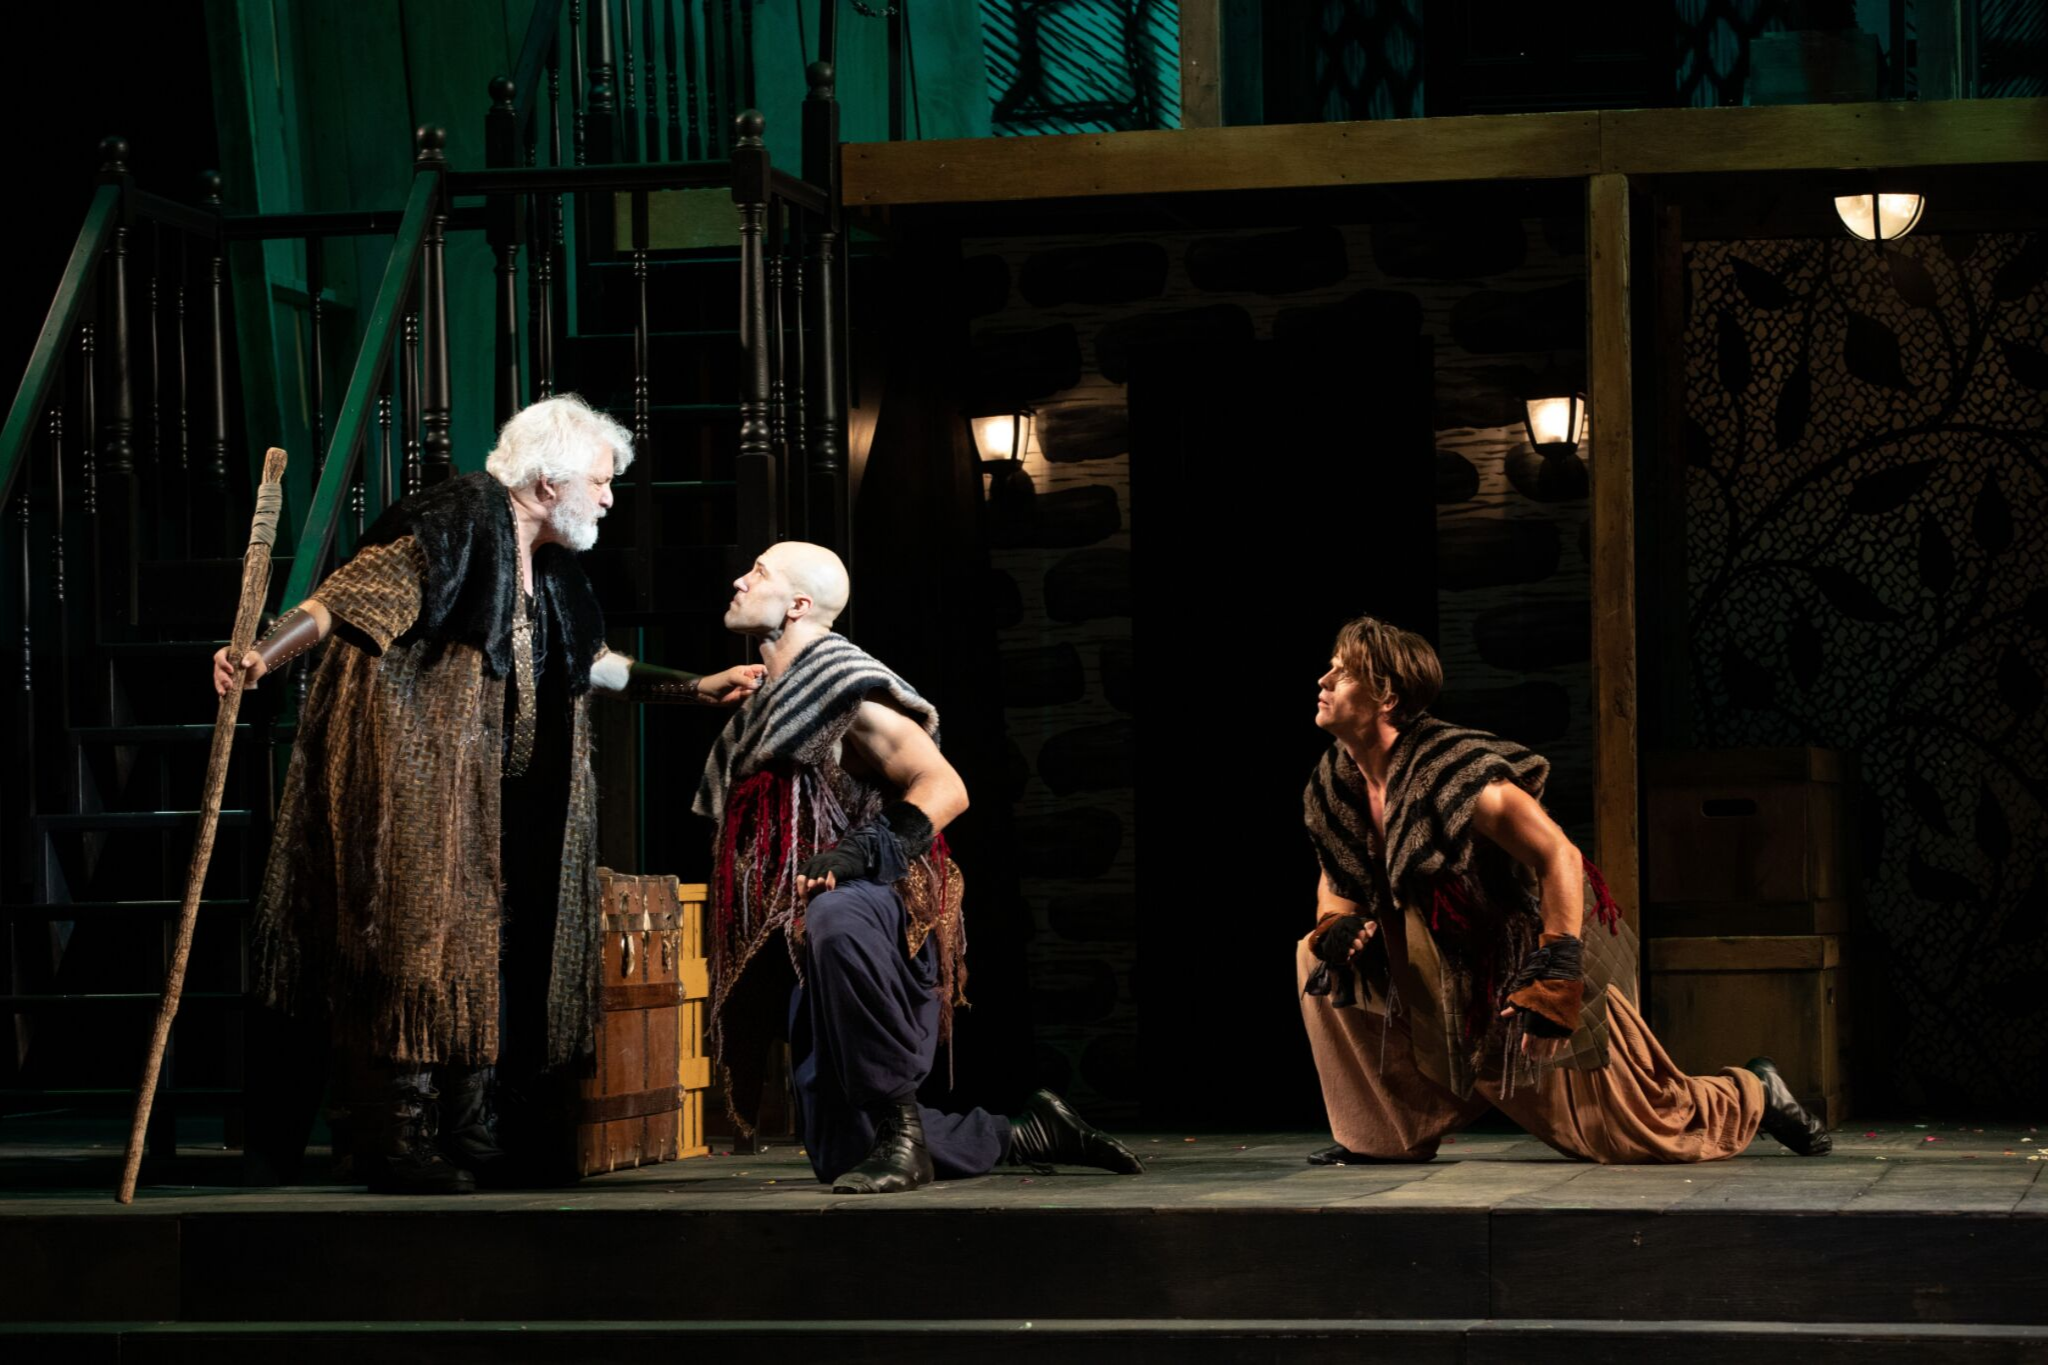 Tom Gleadow (Belarius), Jonathan Higginbotham (Guiderius), and Michael Underhill (Arviragus) in Cymbeline, Shakespeare on the Common 2019-Photo by Evgenia Eliseeva